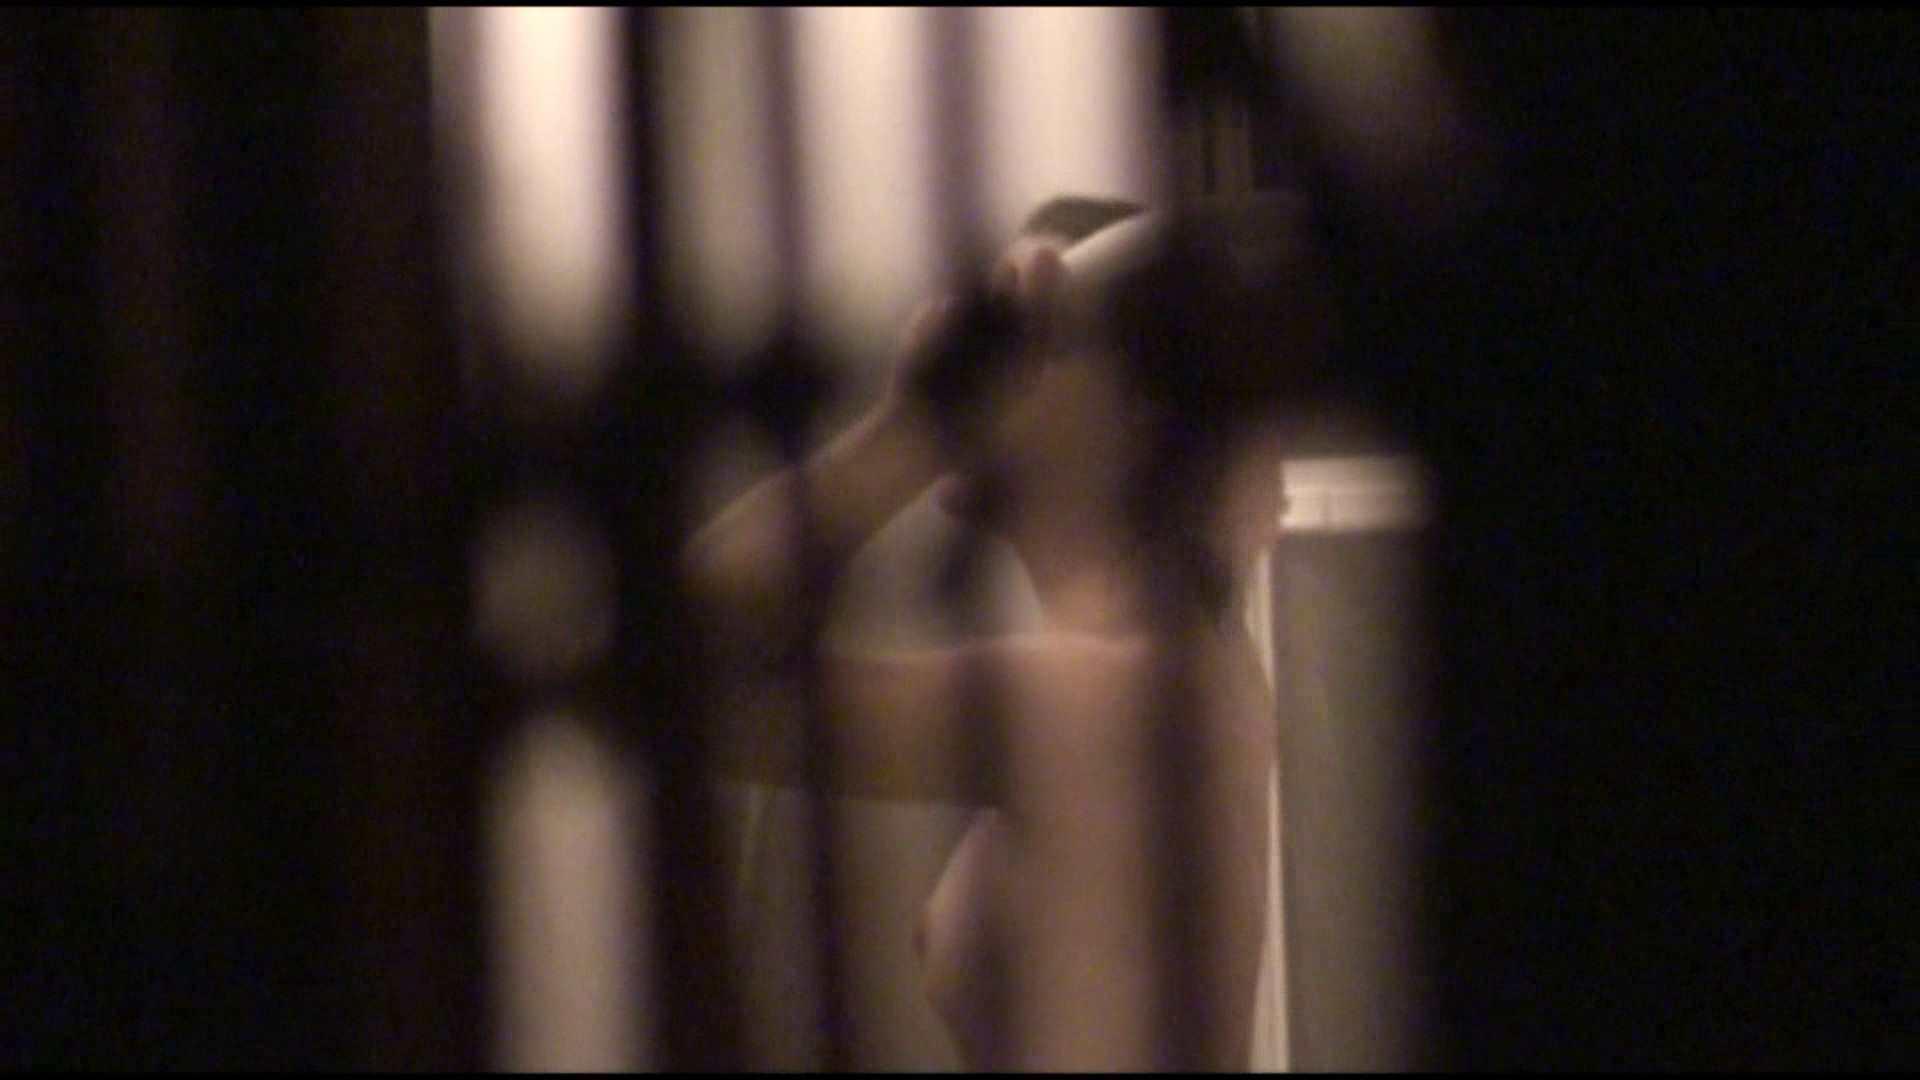 vol.05最高の極上美人!可愛い彼女の裸体をどうぞ!風呂上り鏡チェックも必見! 美人  99PIX 84